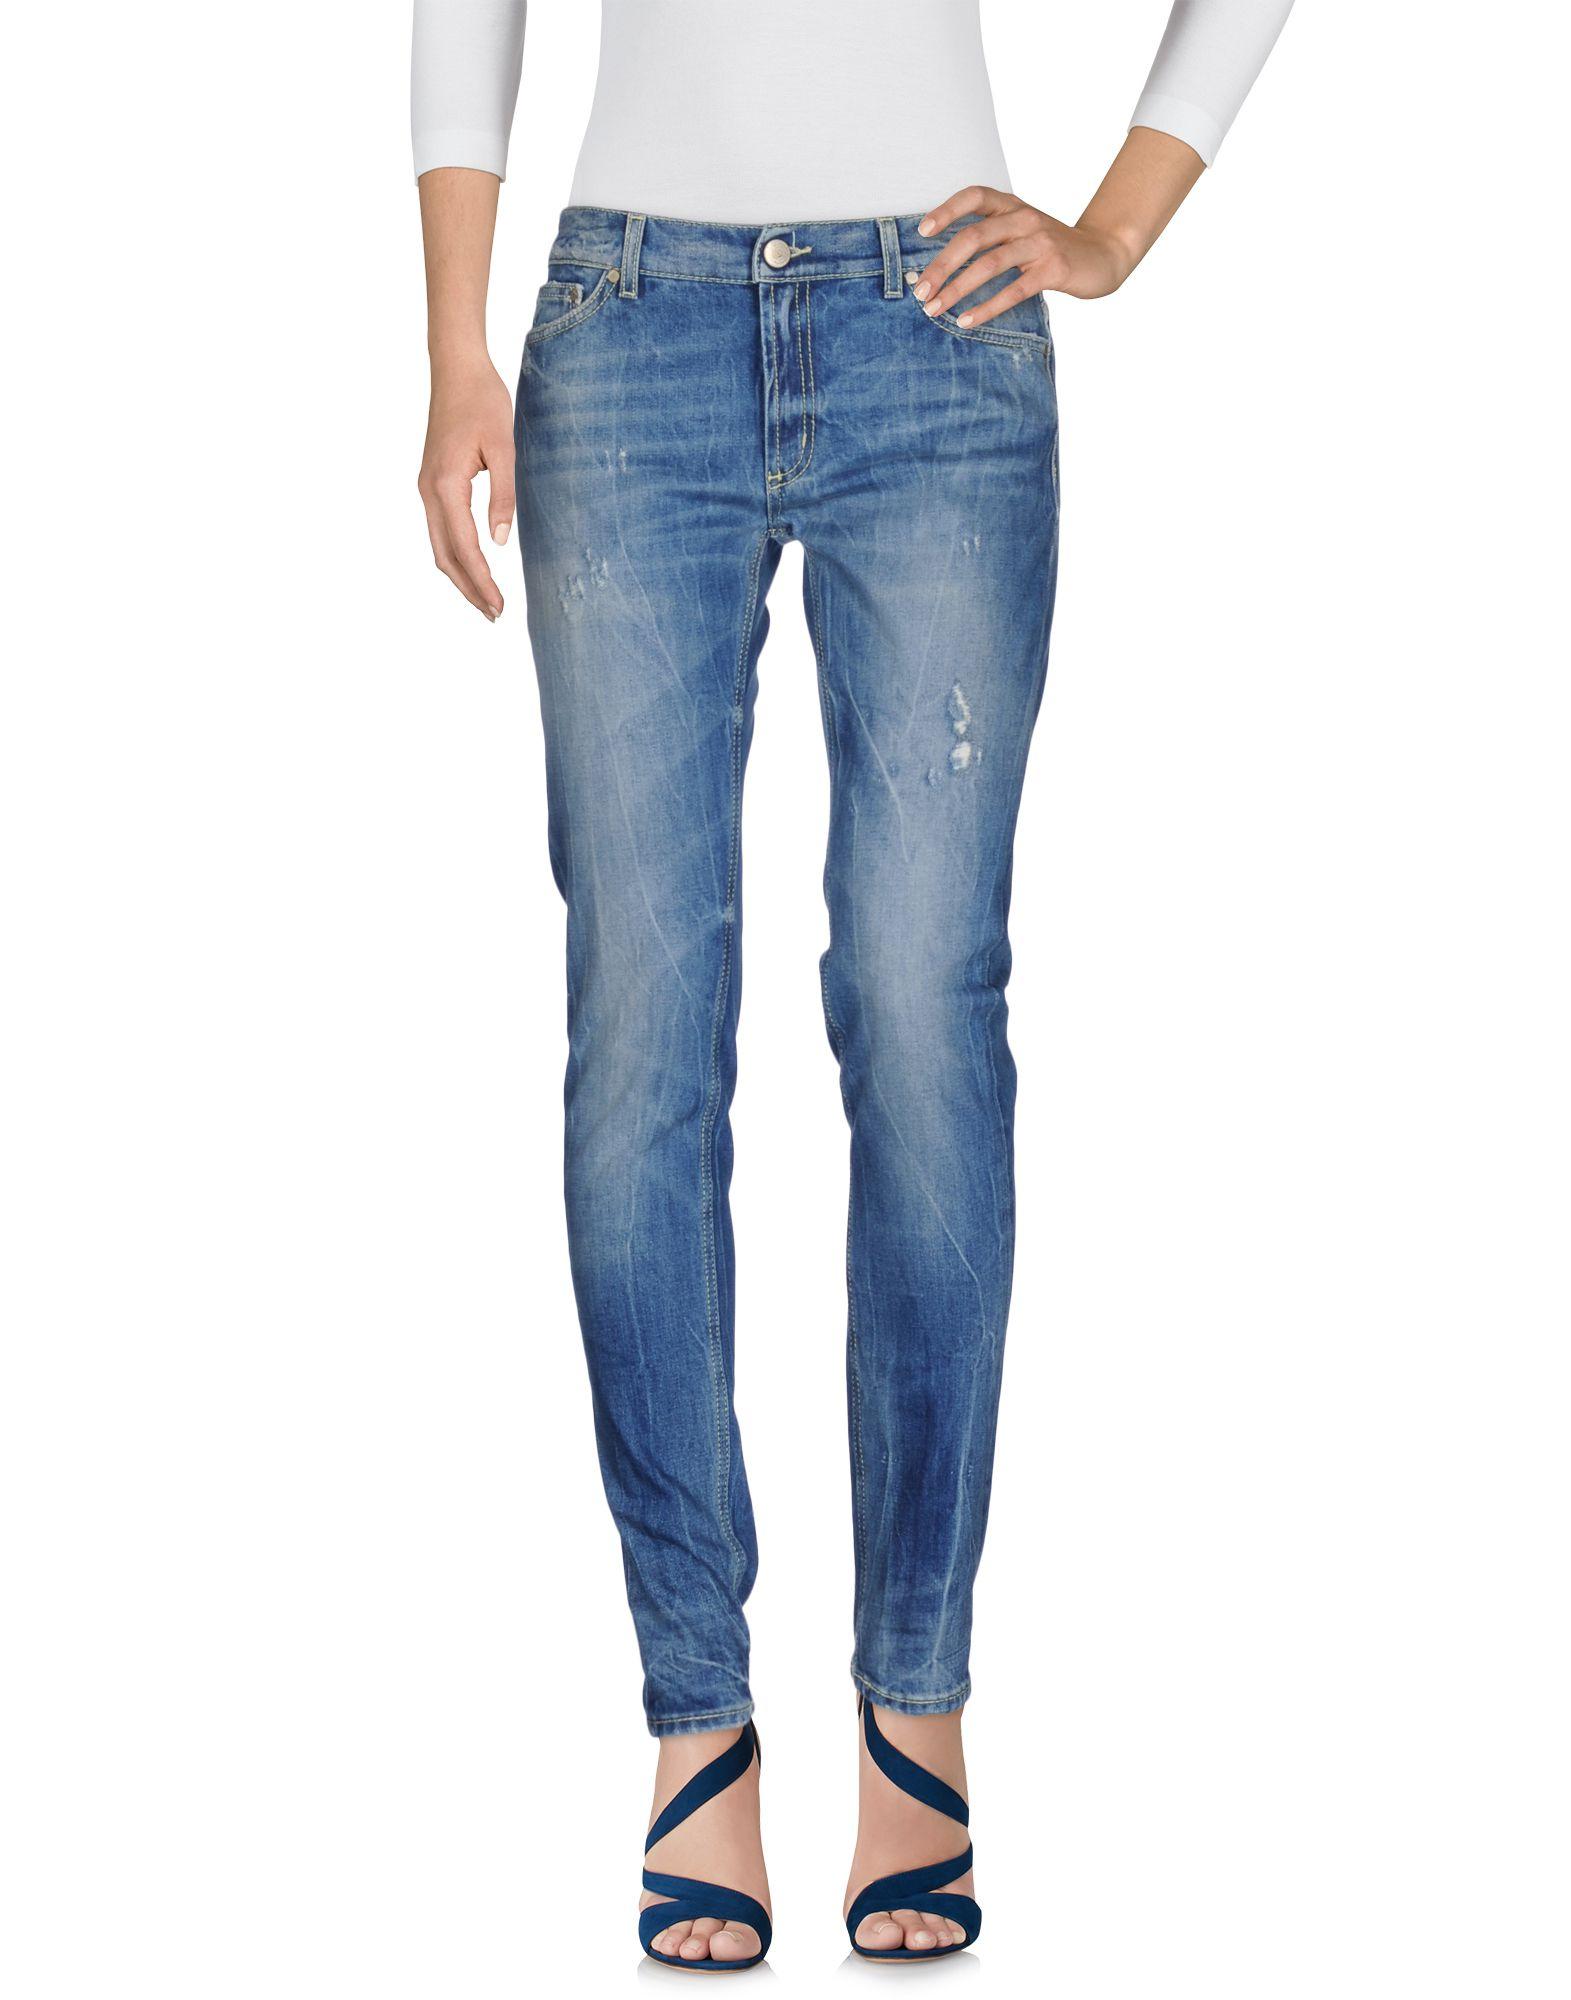 DONDUP Damen Jeanshose Farbe Blau Größe 7 - broschei